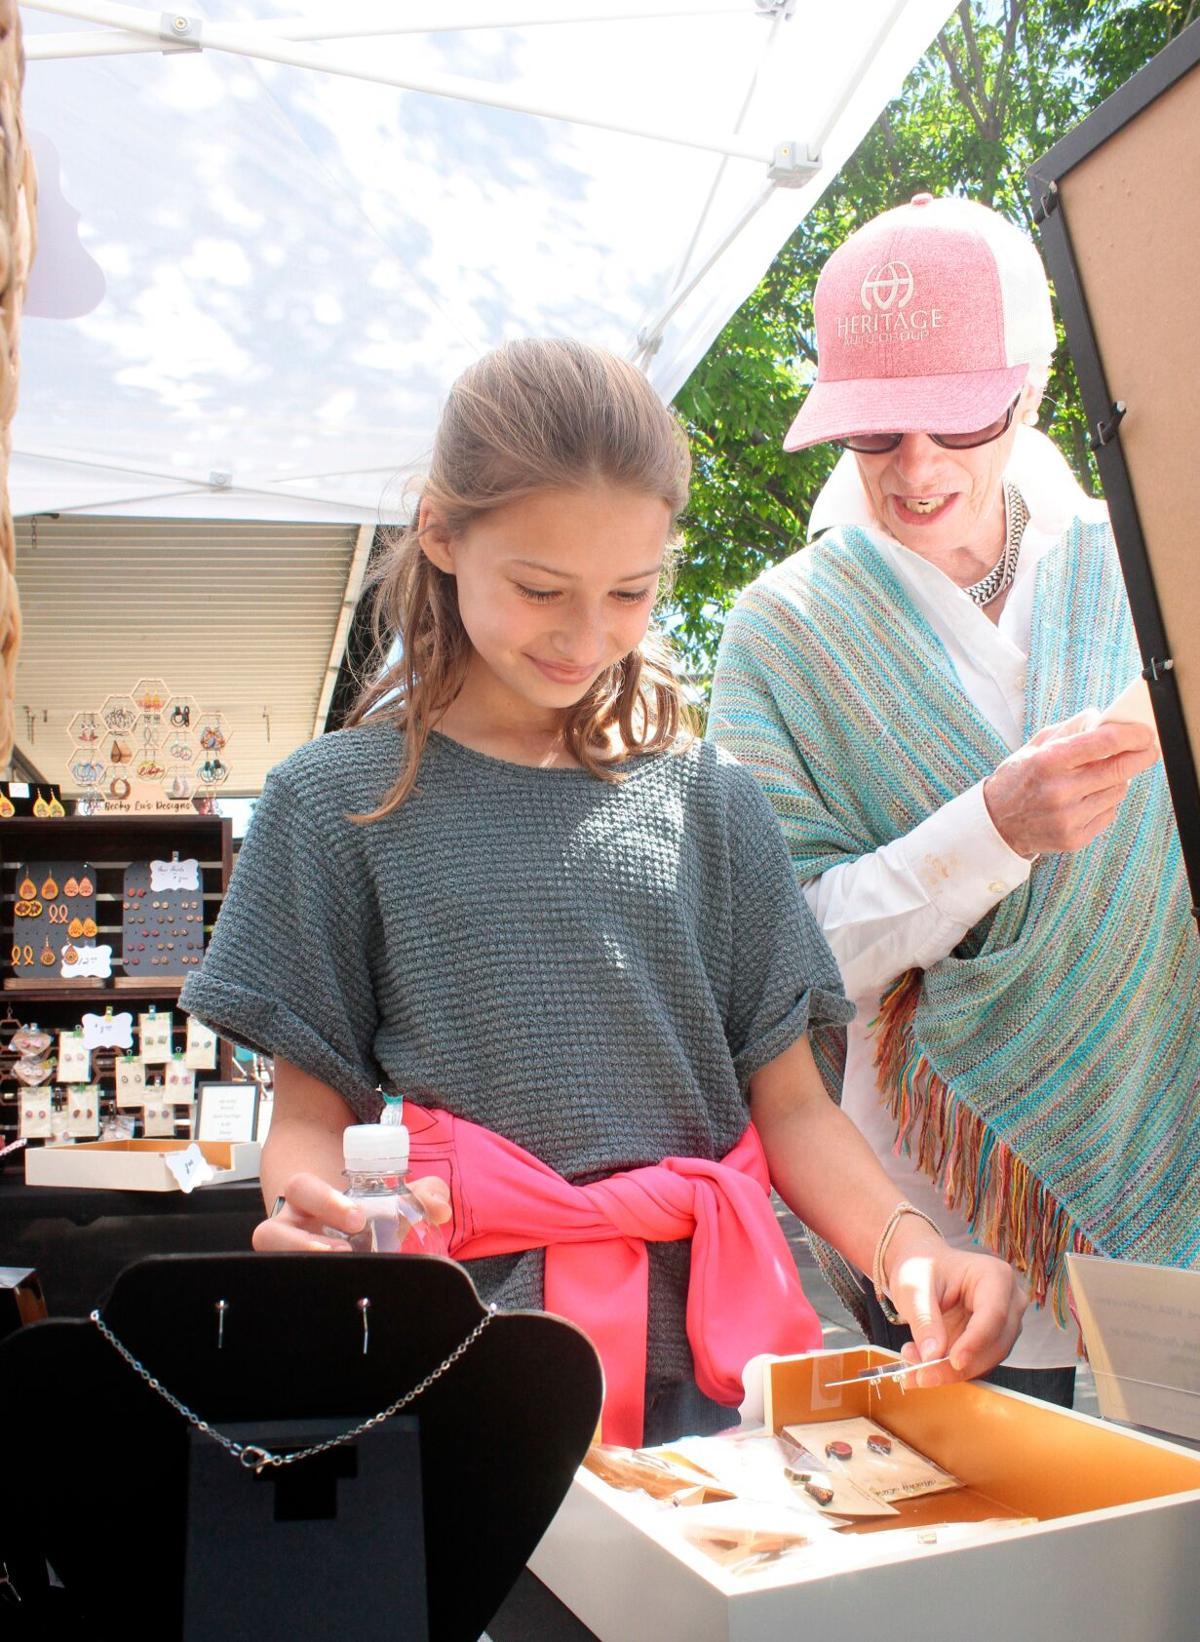 Art, mushroom festivals kick off traditional springtime event season